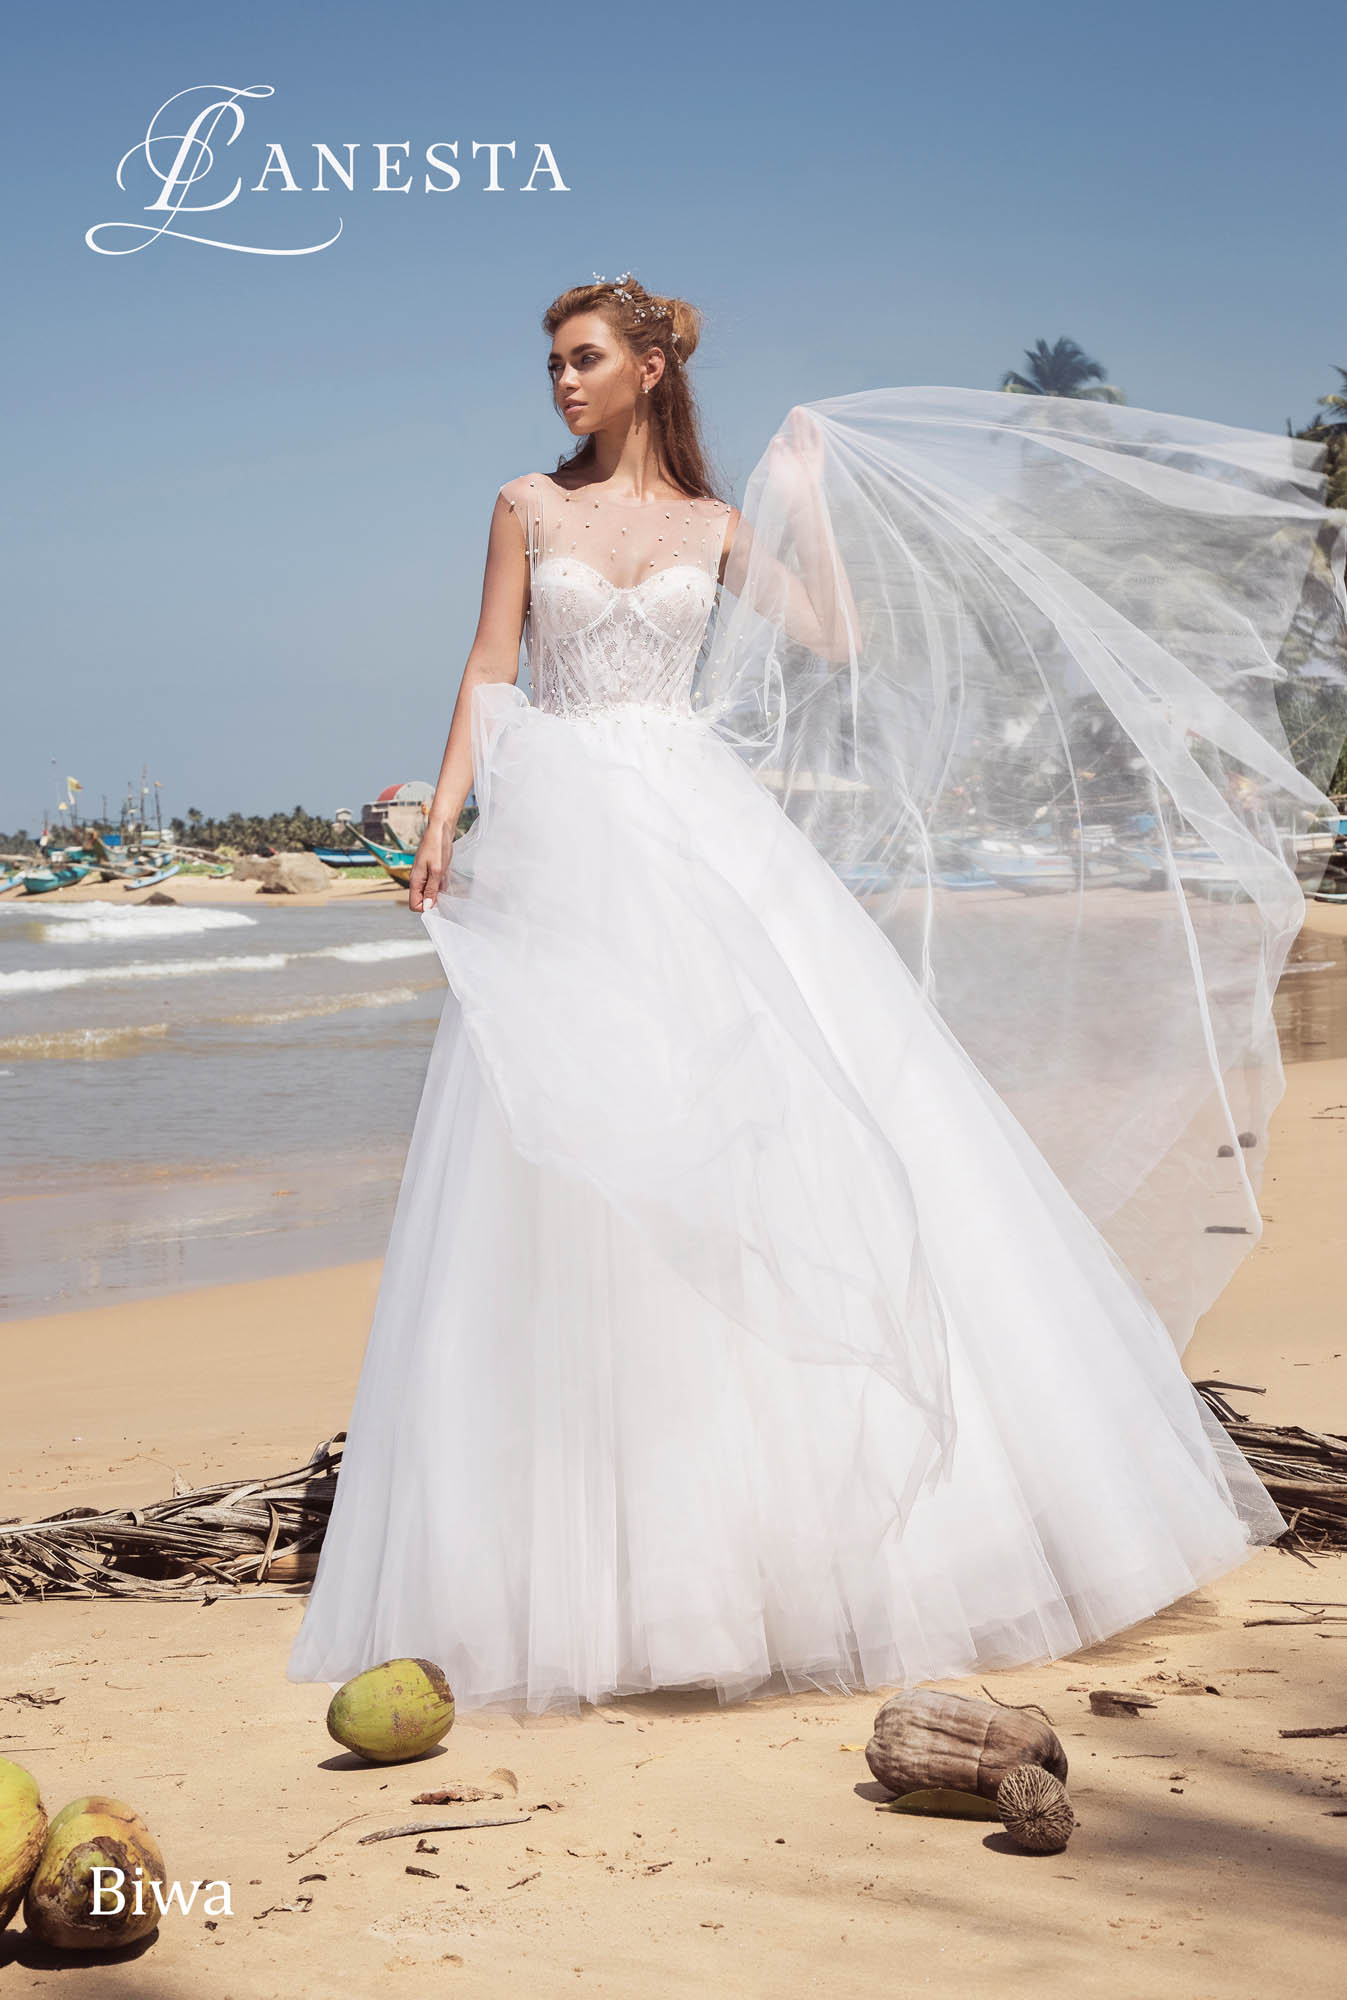 Cвадебное платье Biwa